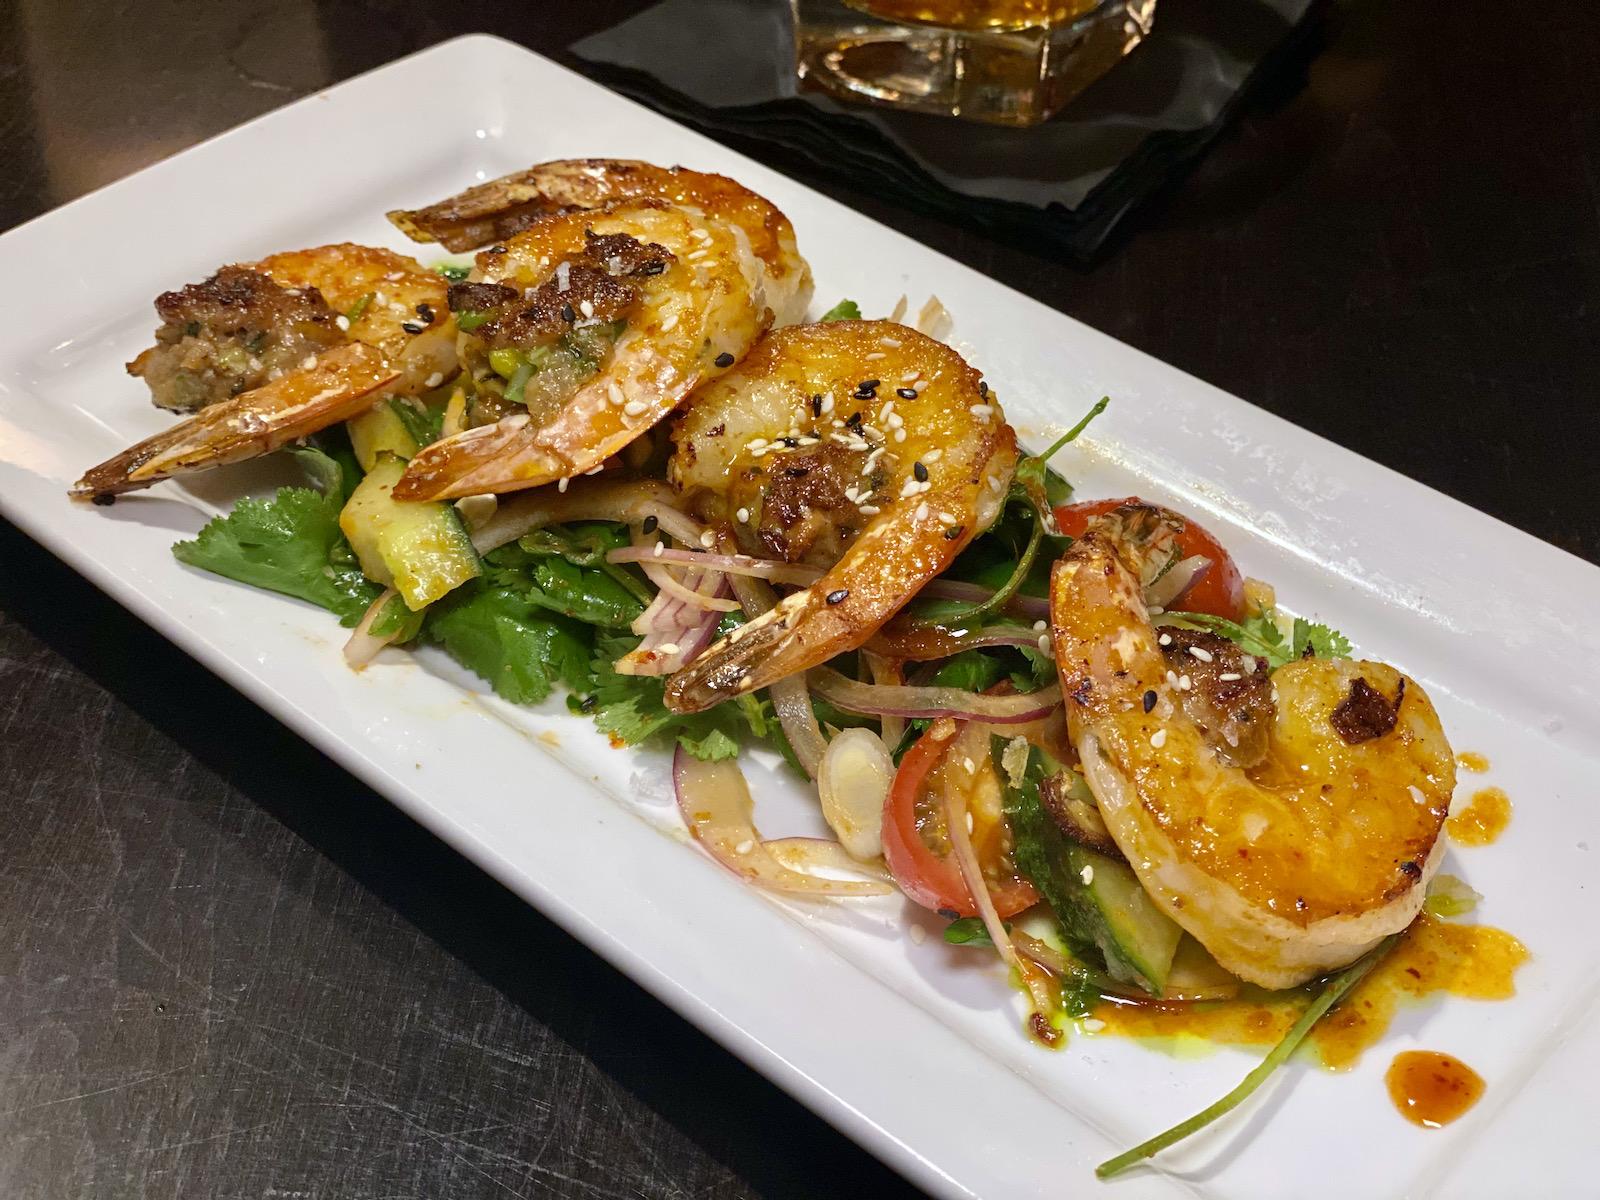 Thai sausage stuffed shrimp